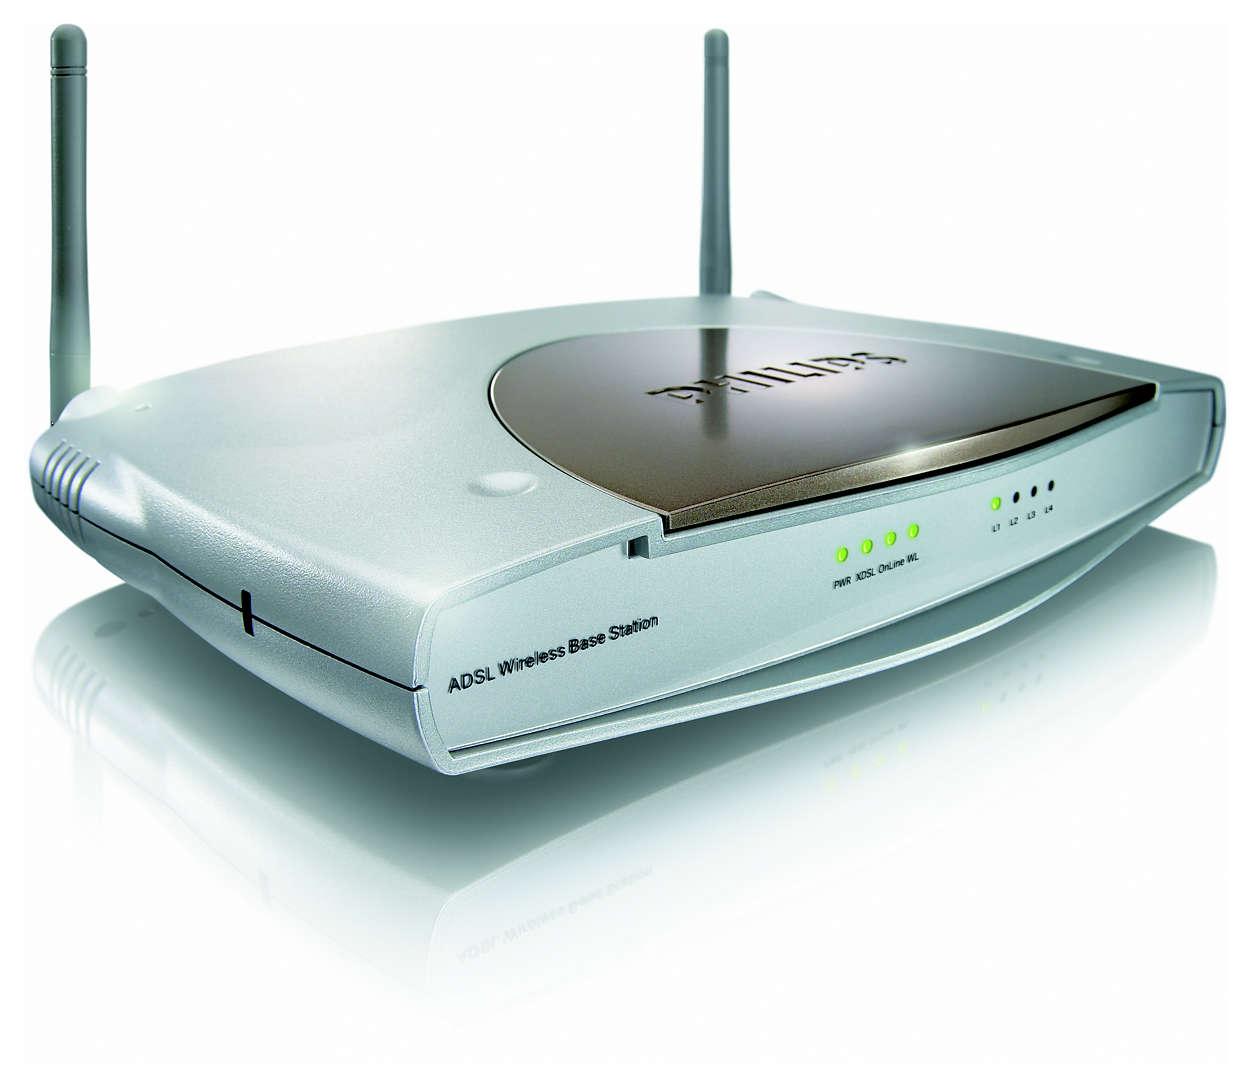 Smart and simple wireless broadband